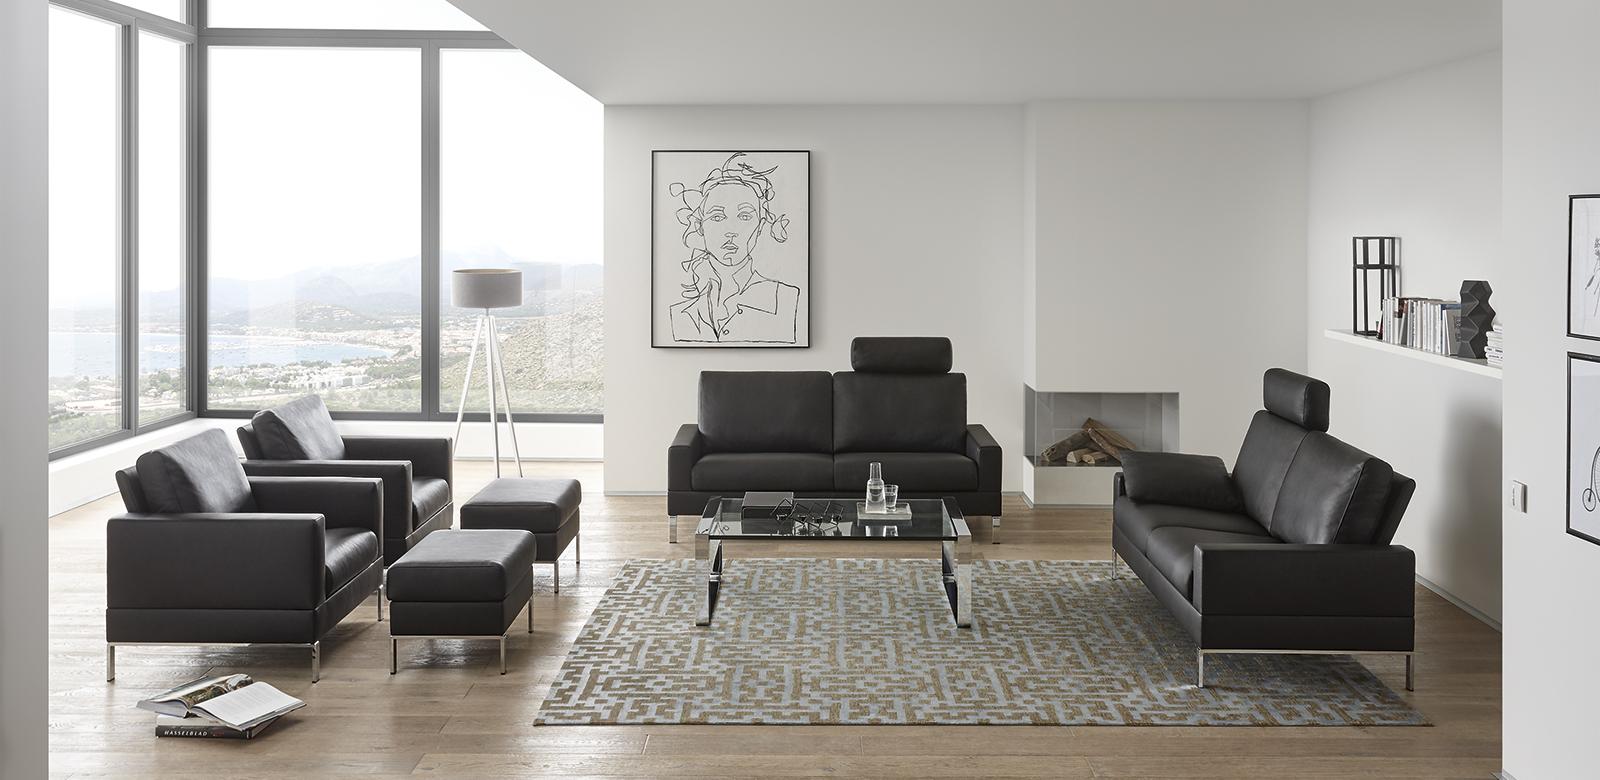 designsofa monza das edle ledersofa von erpo. Black Bedroom Furniture Sets. Home Design Ideas